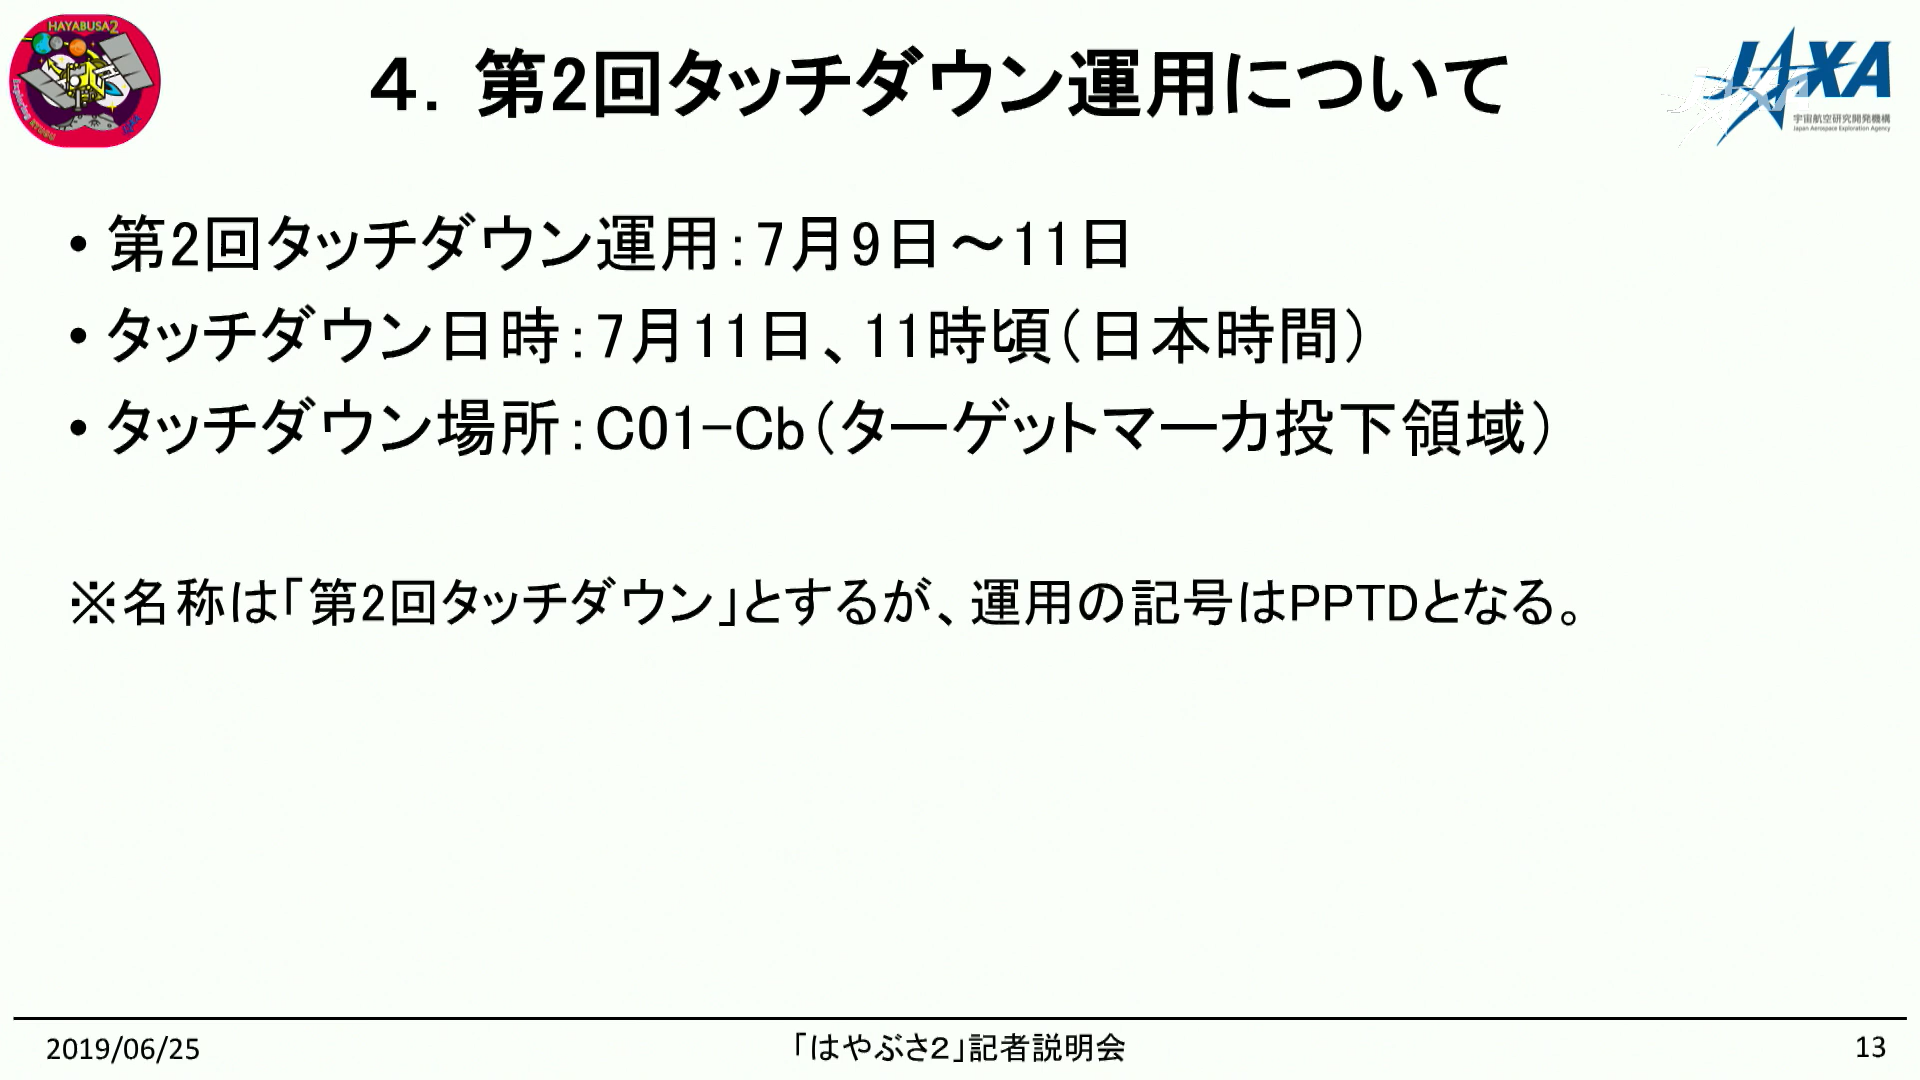 f:id:Imamura:20190625234743p:plain